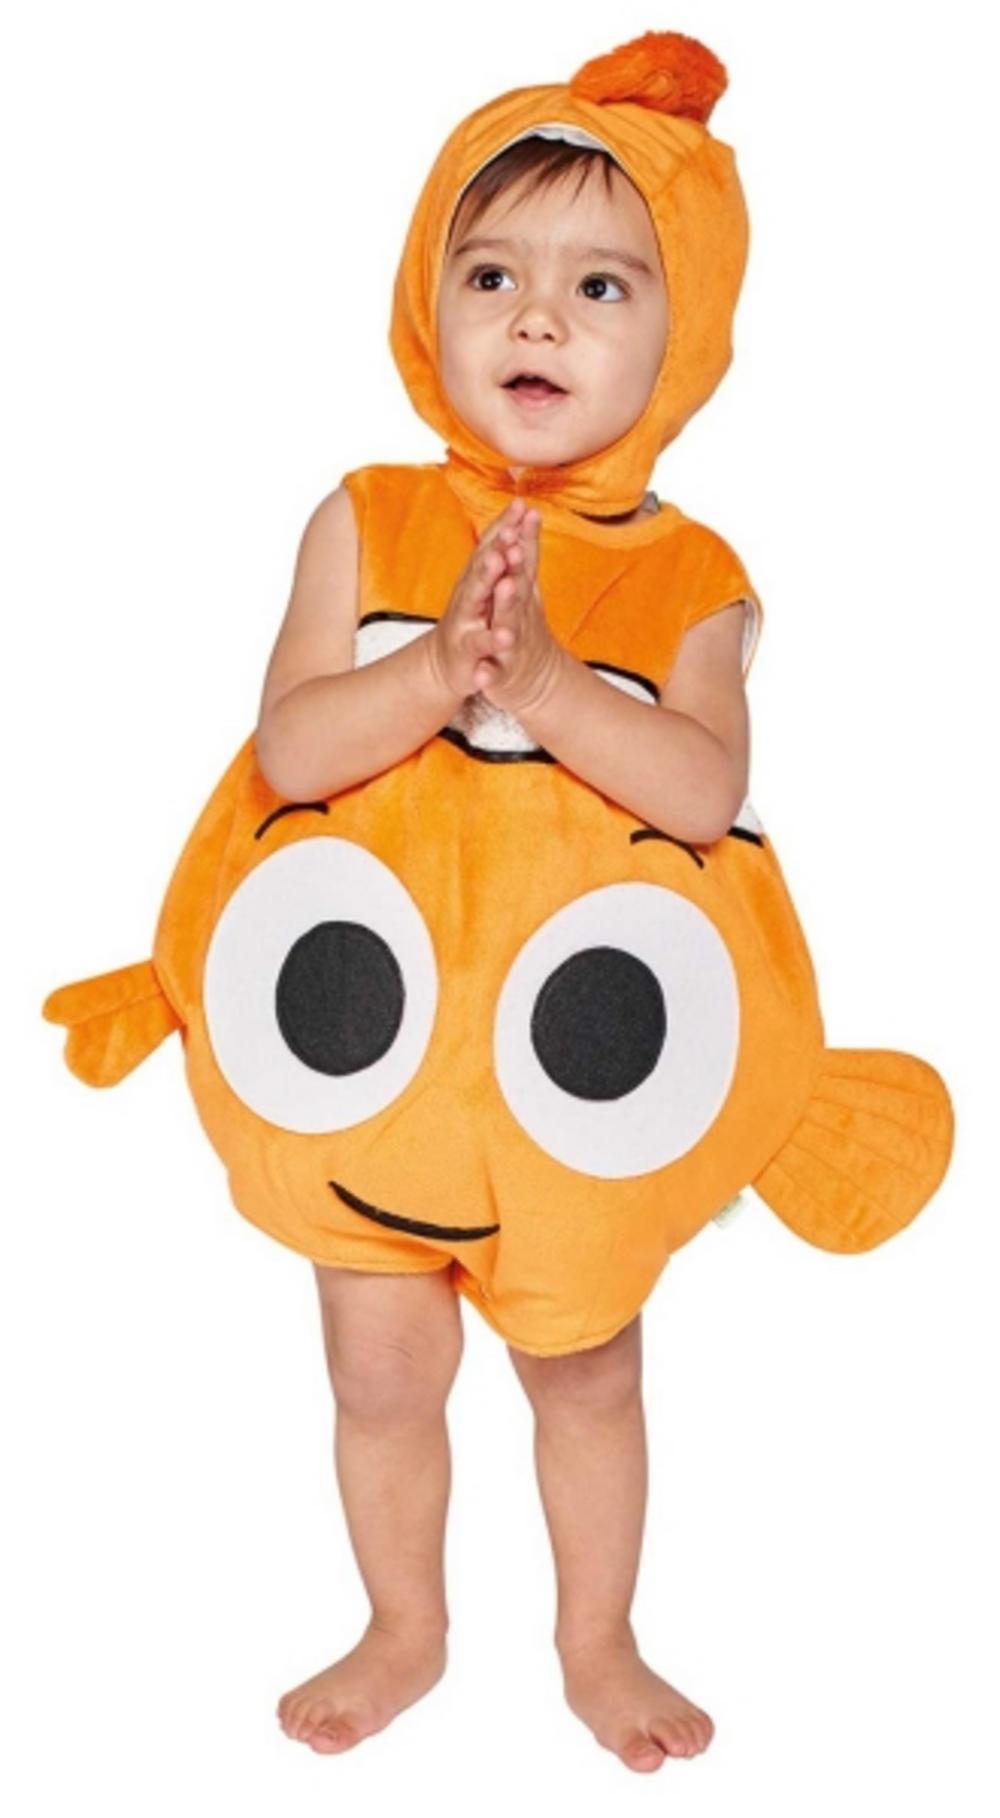 Finding Nemo Plush Tabard Toddlers Costume